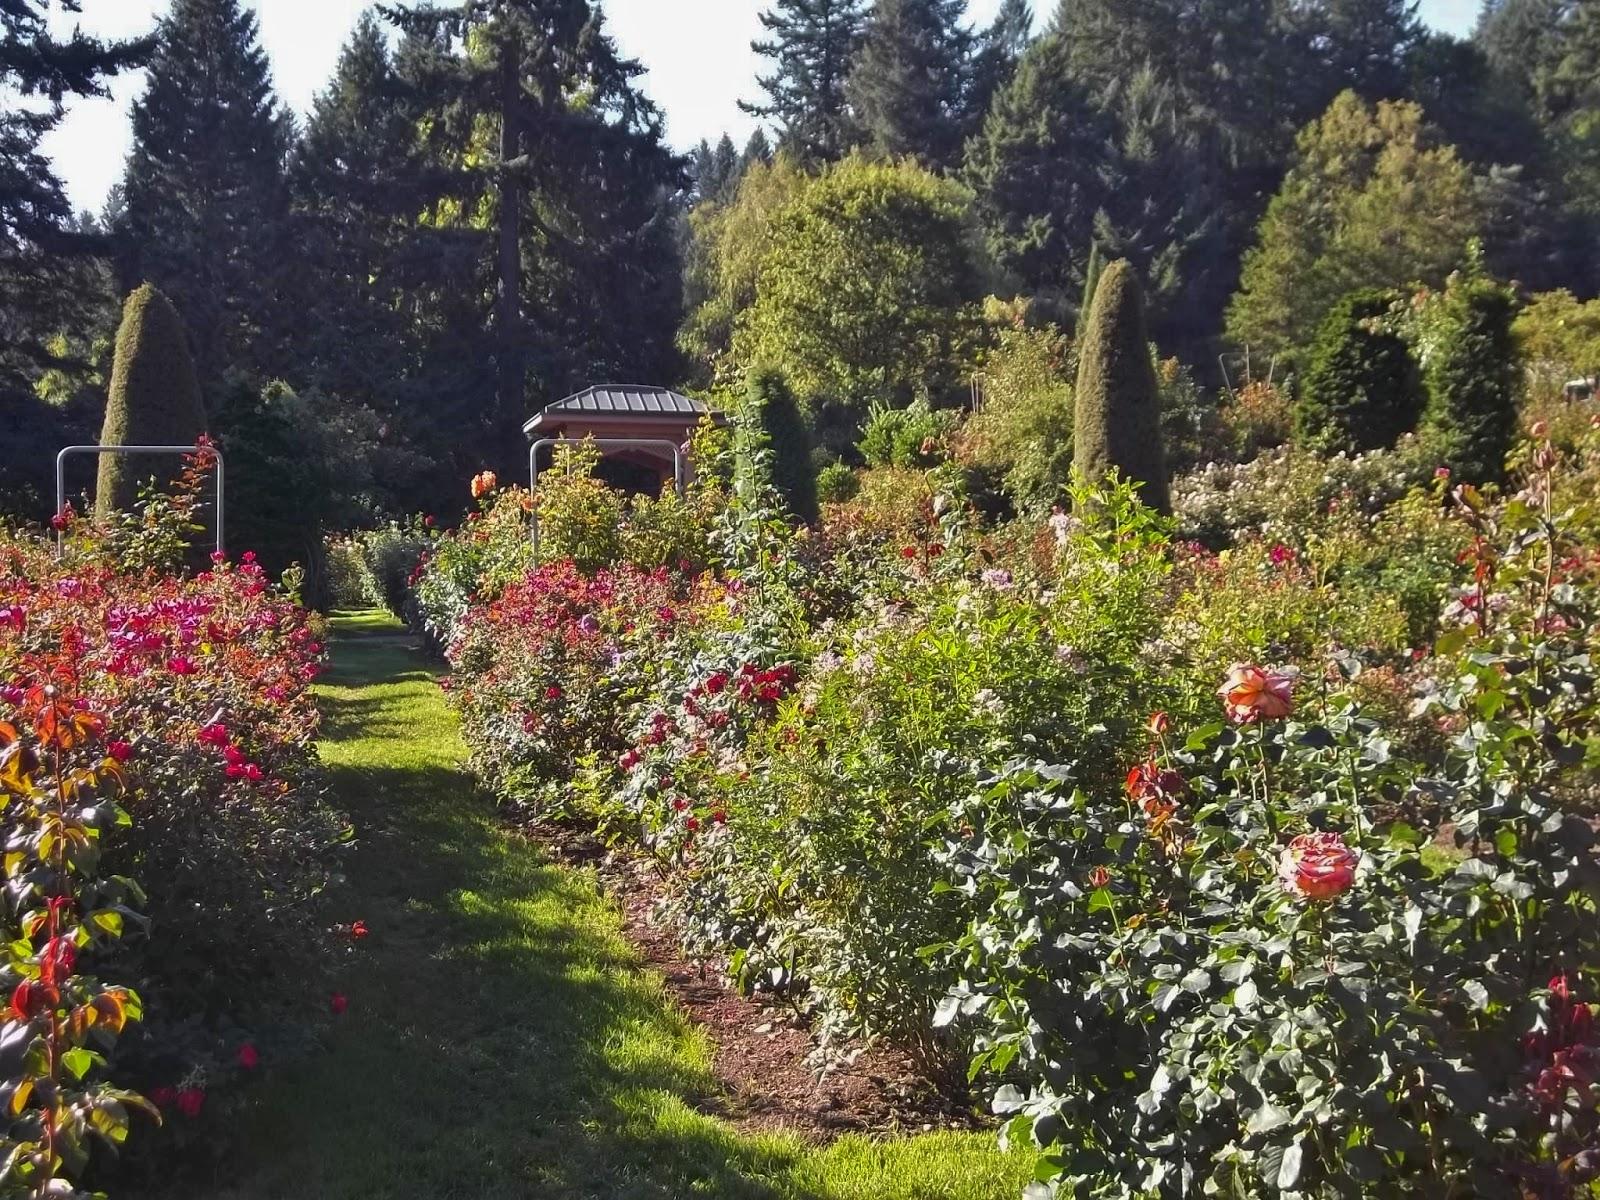 Seattle Urban Landscape October 2017